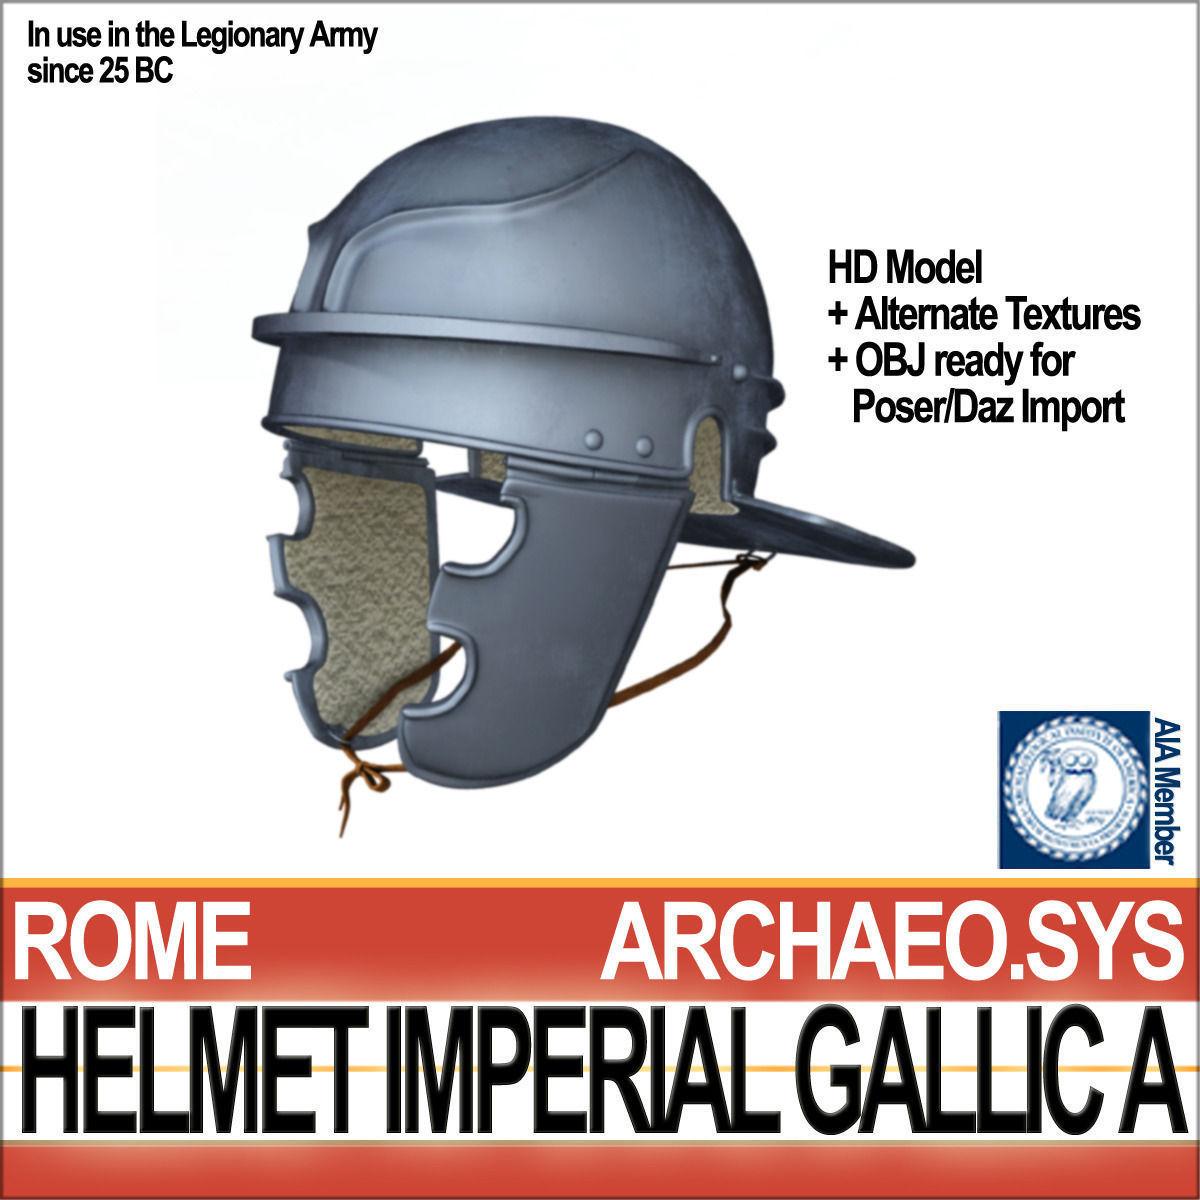 Roman Legionary Helmet Imperial Gallic A